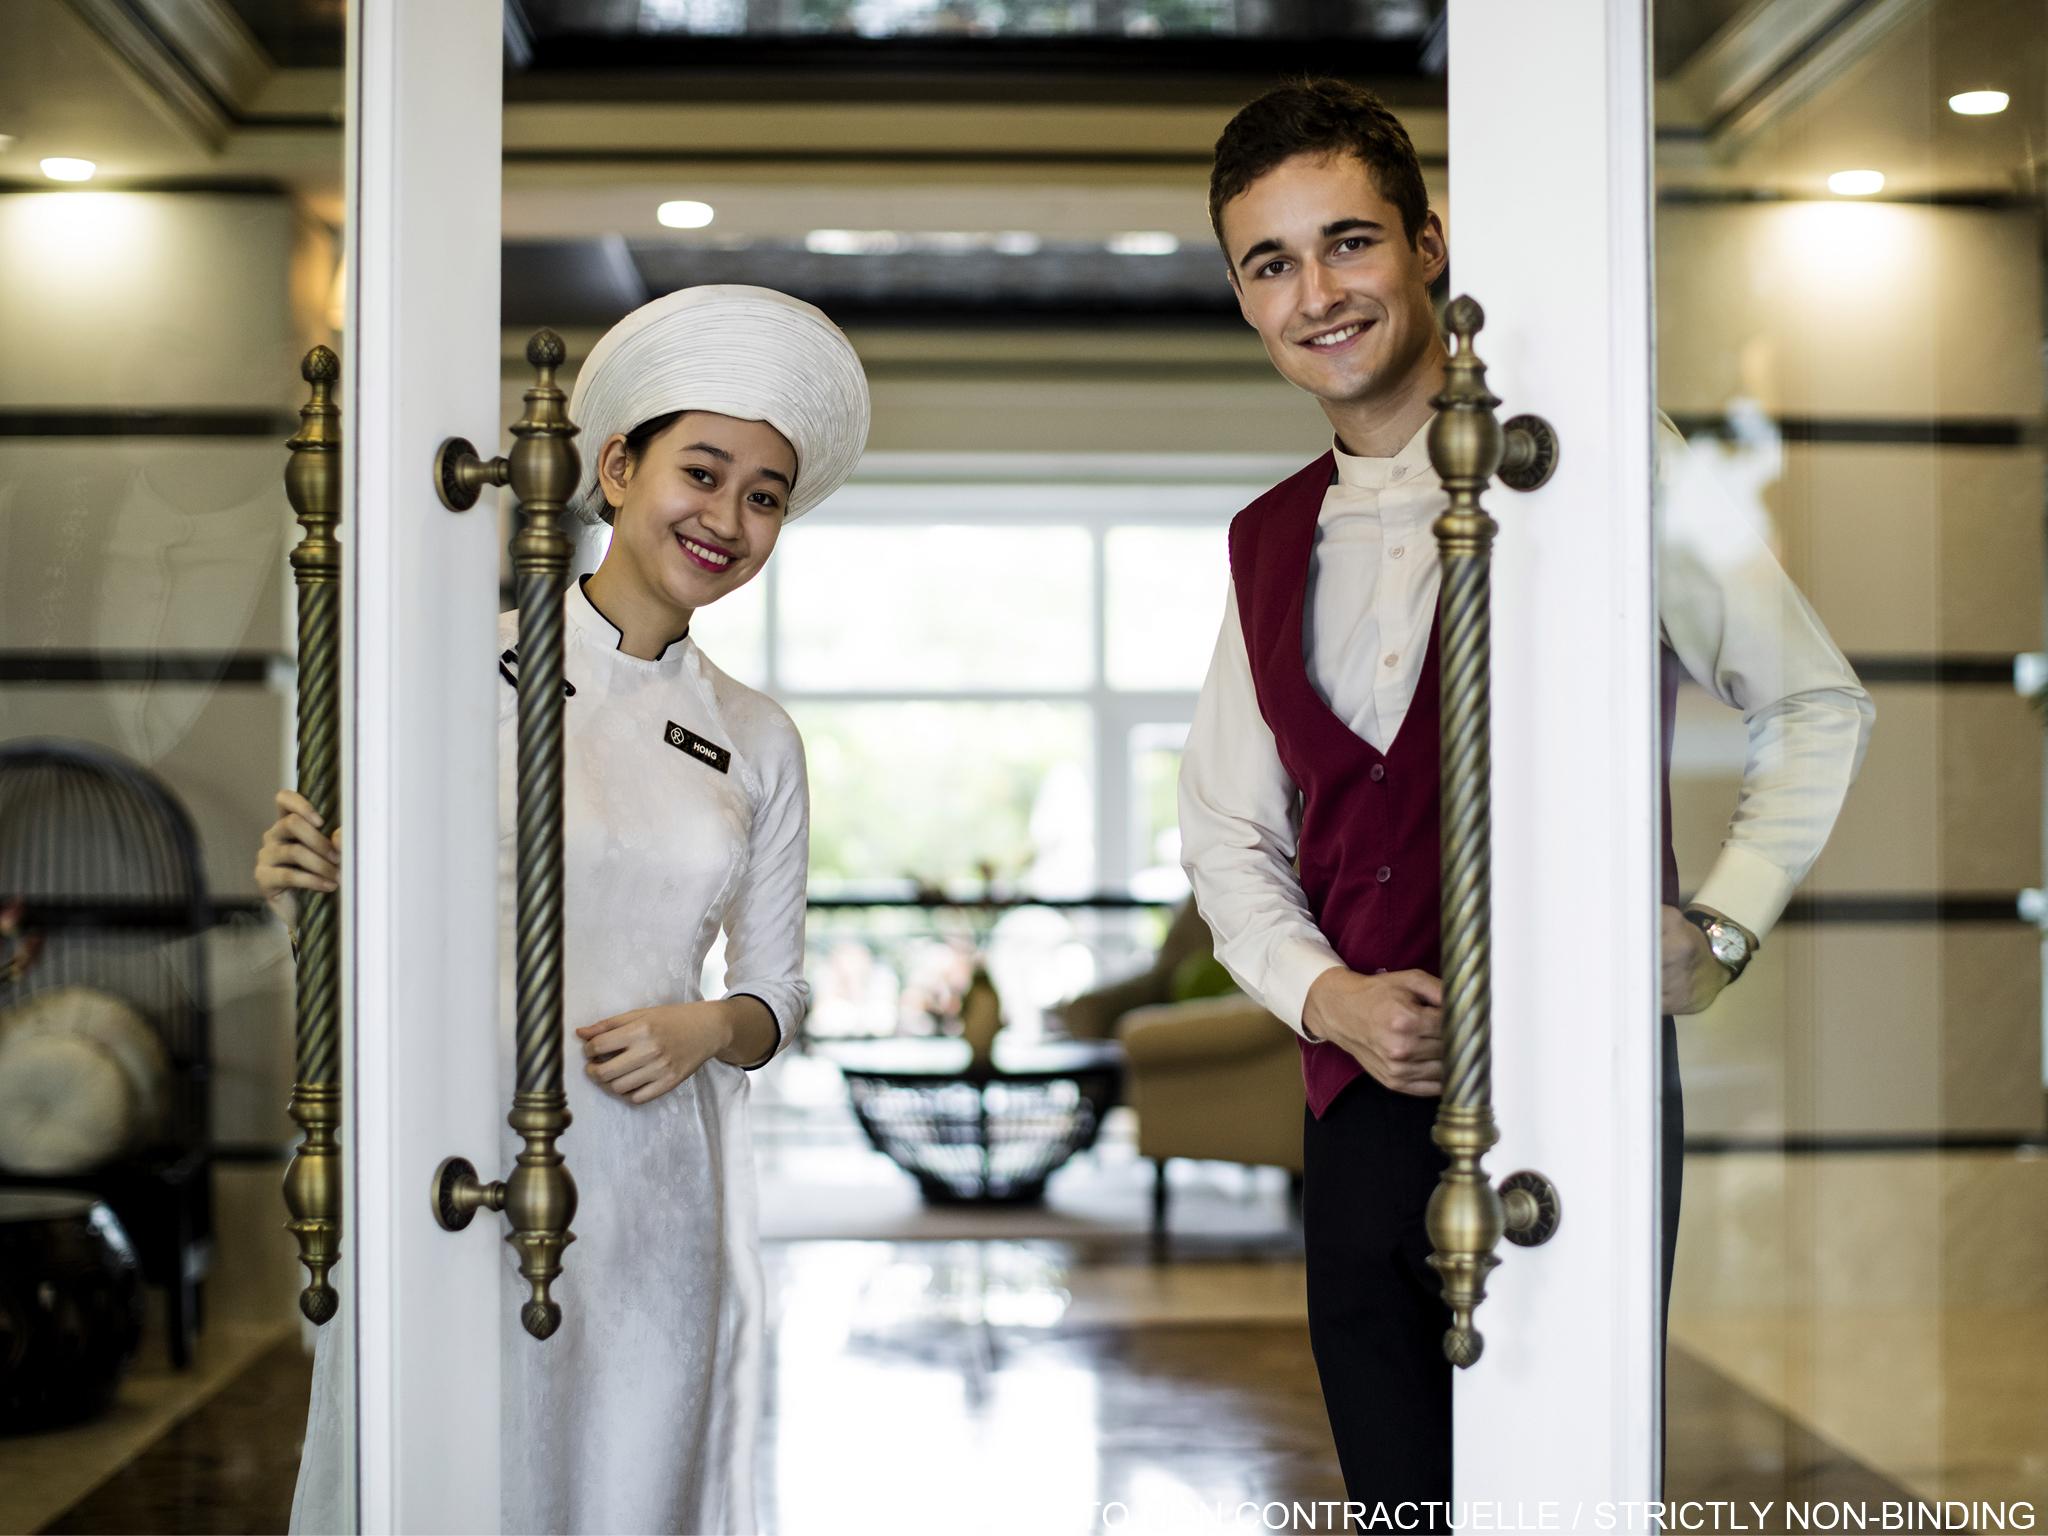 Hotel – The Mitchelton Hotel Nagambie (apertura a luglio 2018)